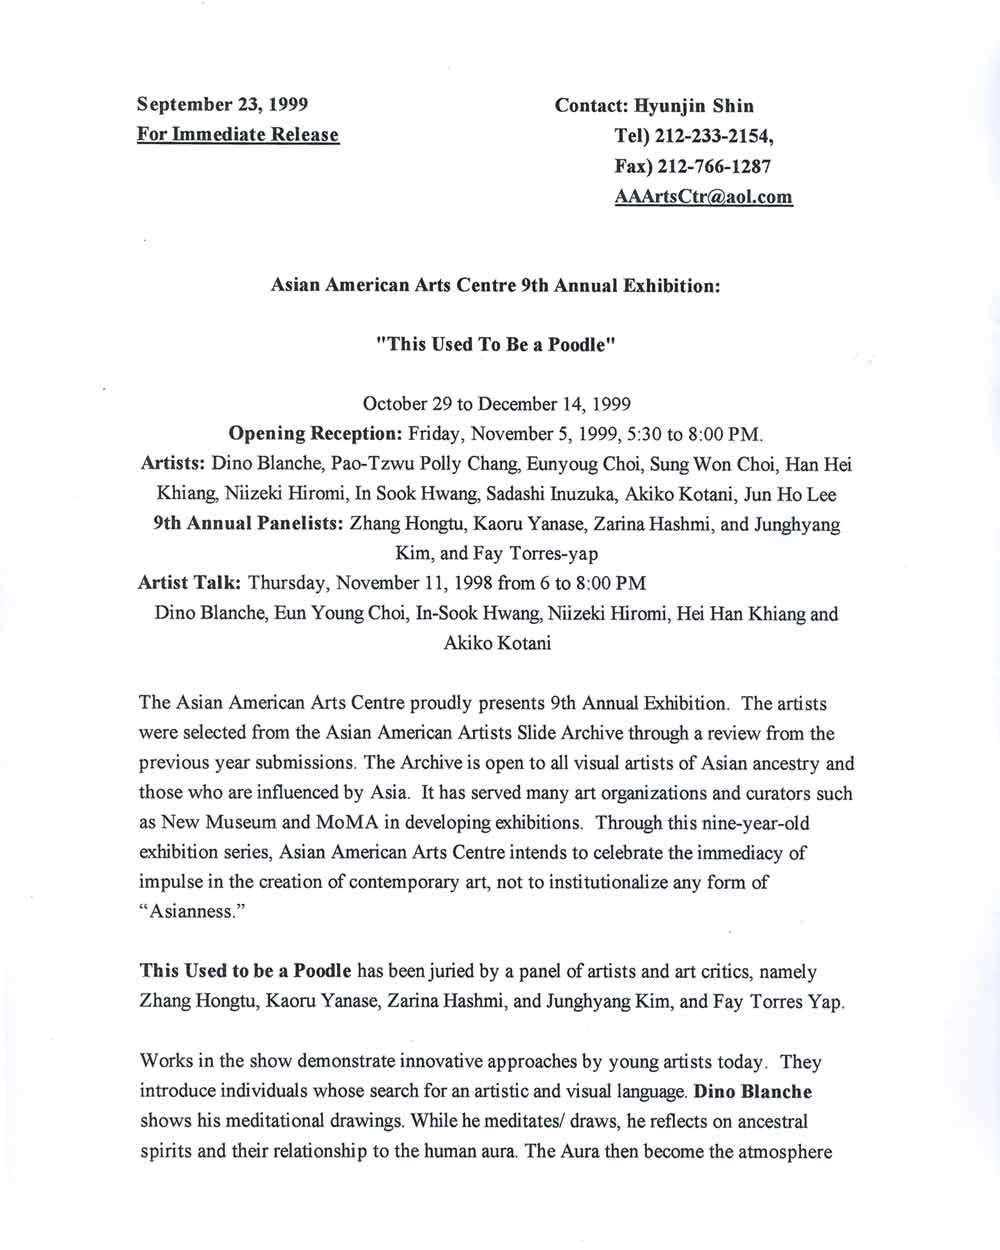 Poodle press release, pg 1